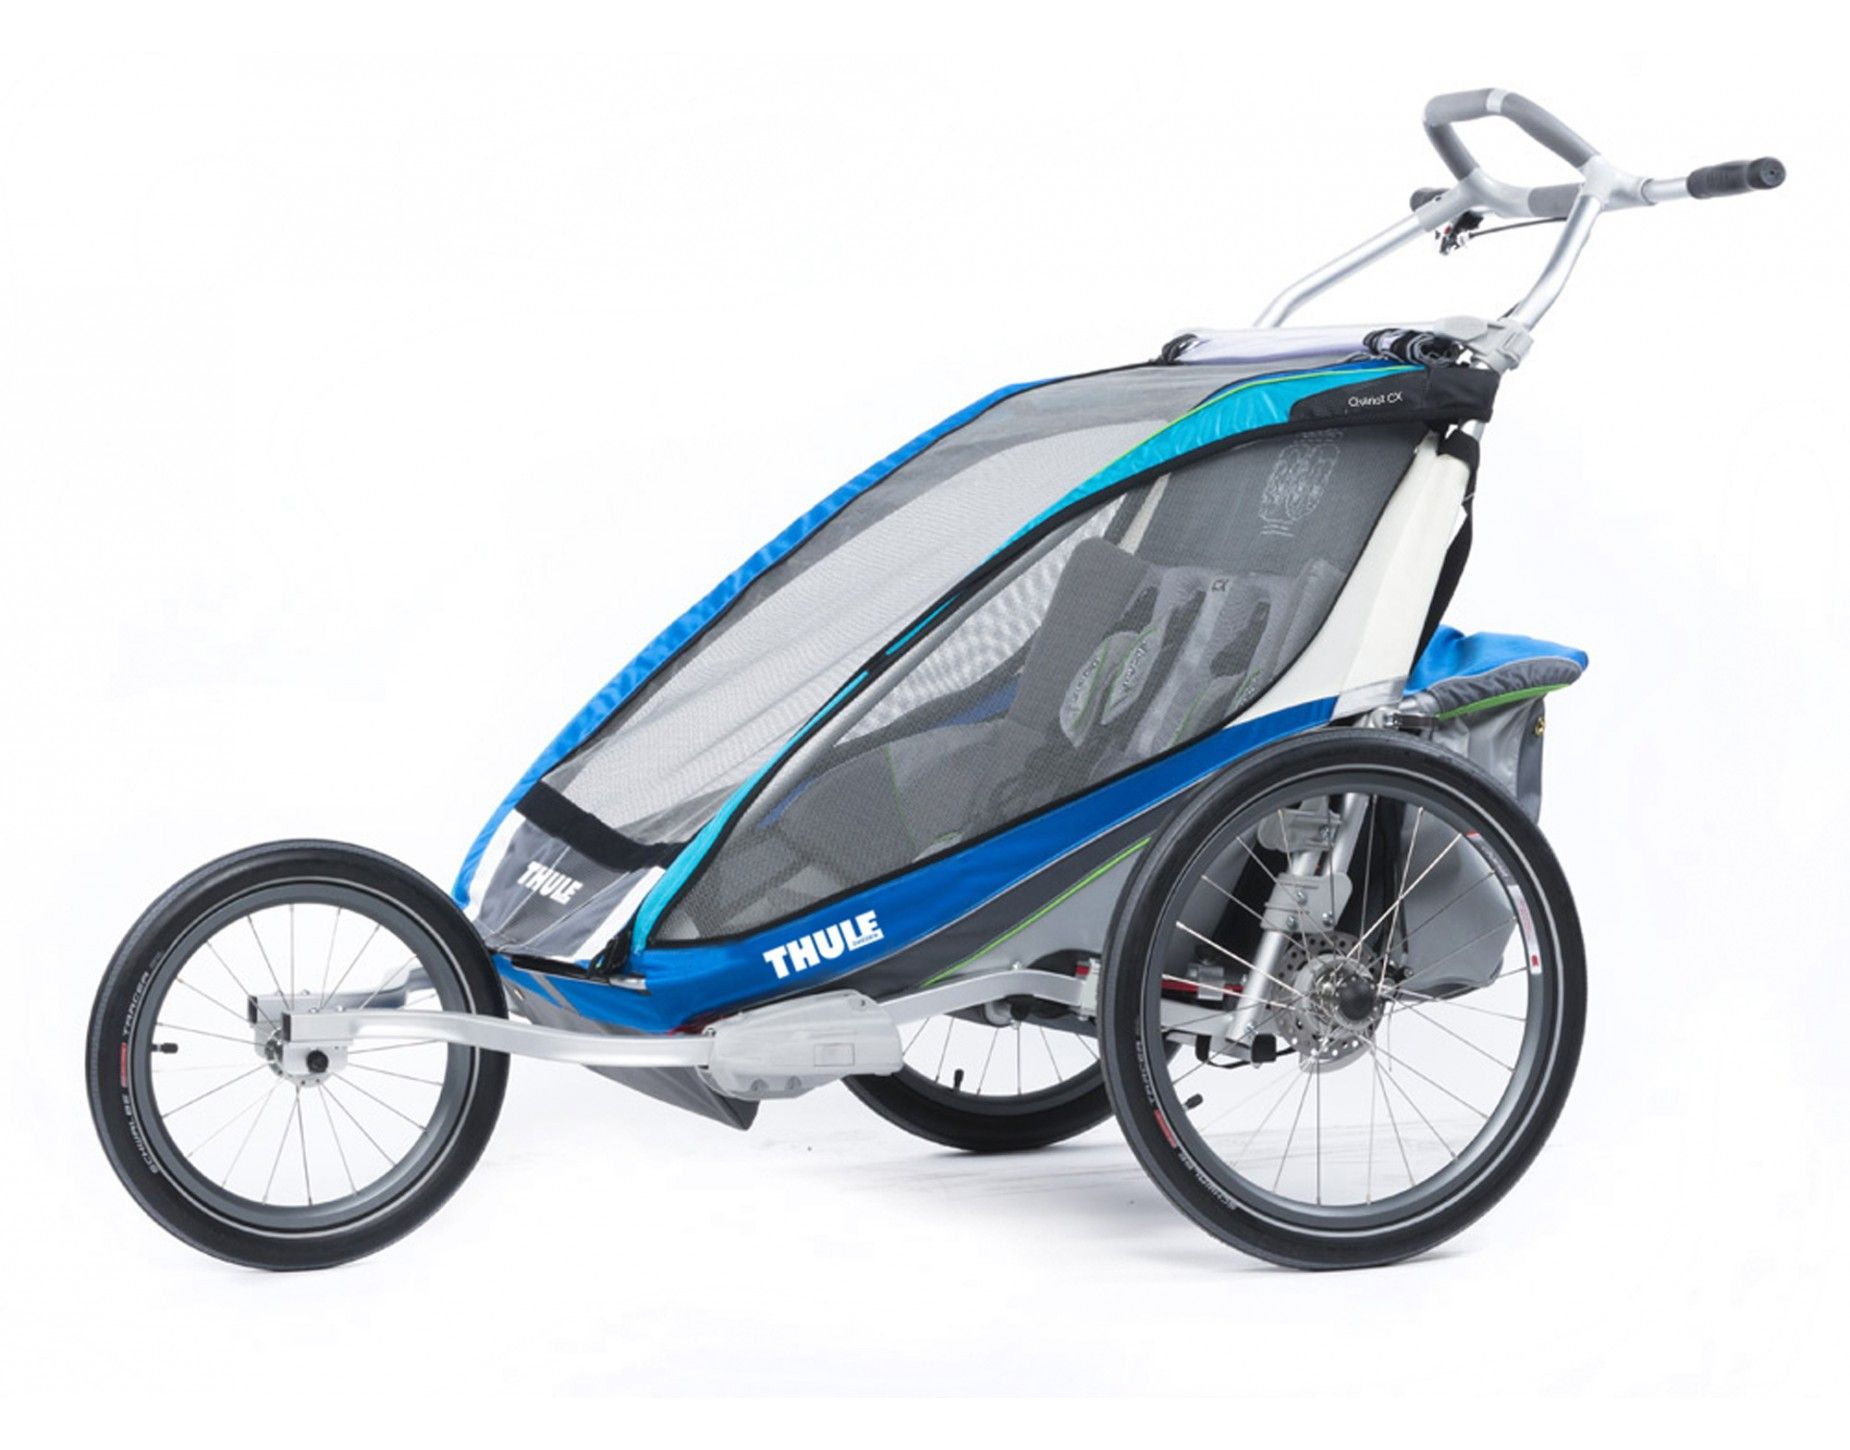 THULE CHARIOT CX1 Child bike trailer, Bike trailer